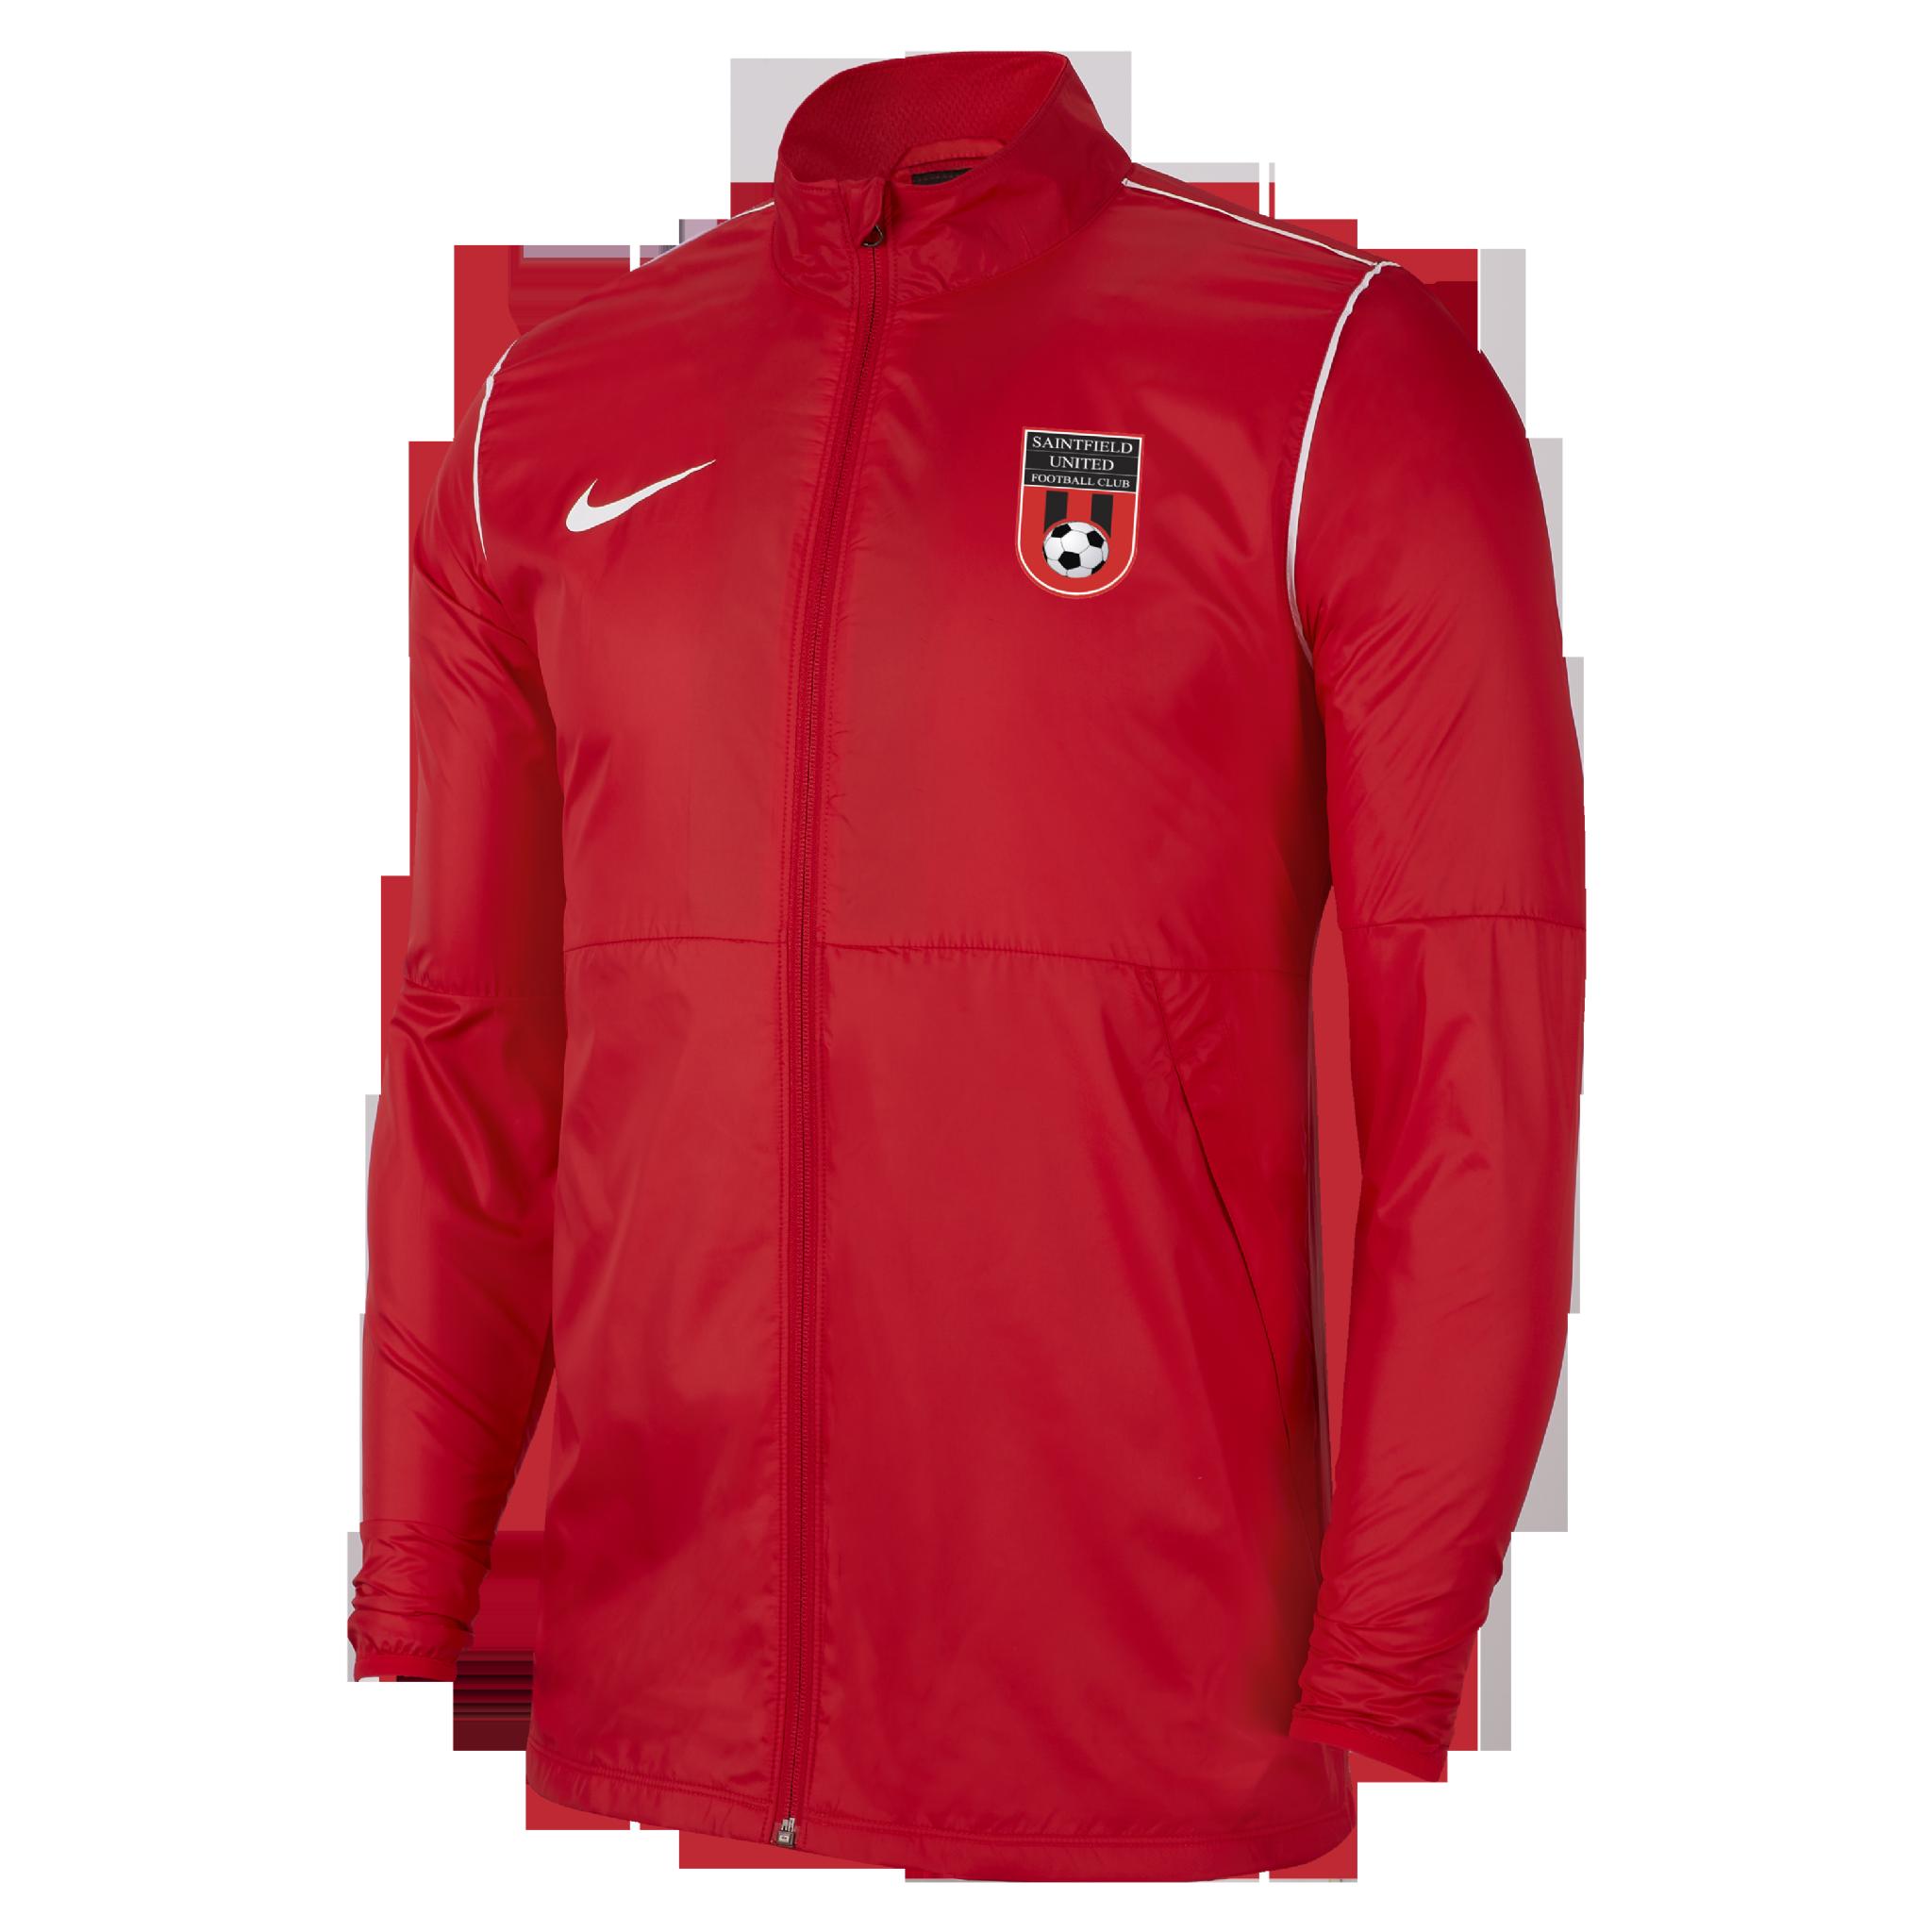 saintfield utd park20 red rain jacket 25275 p